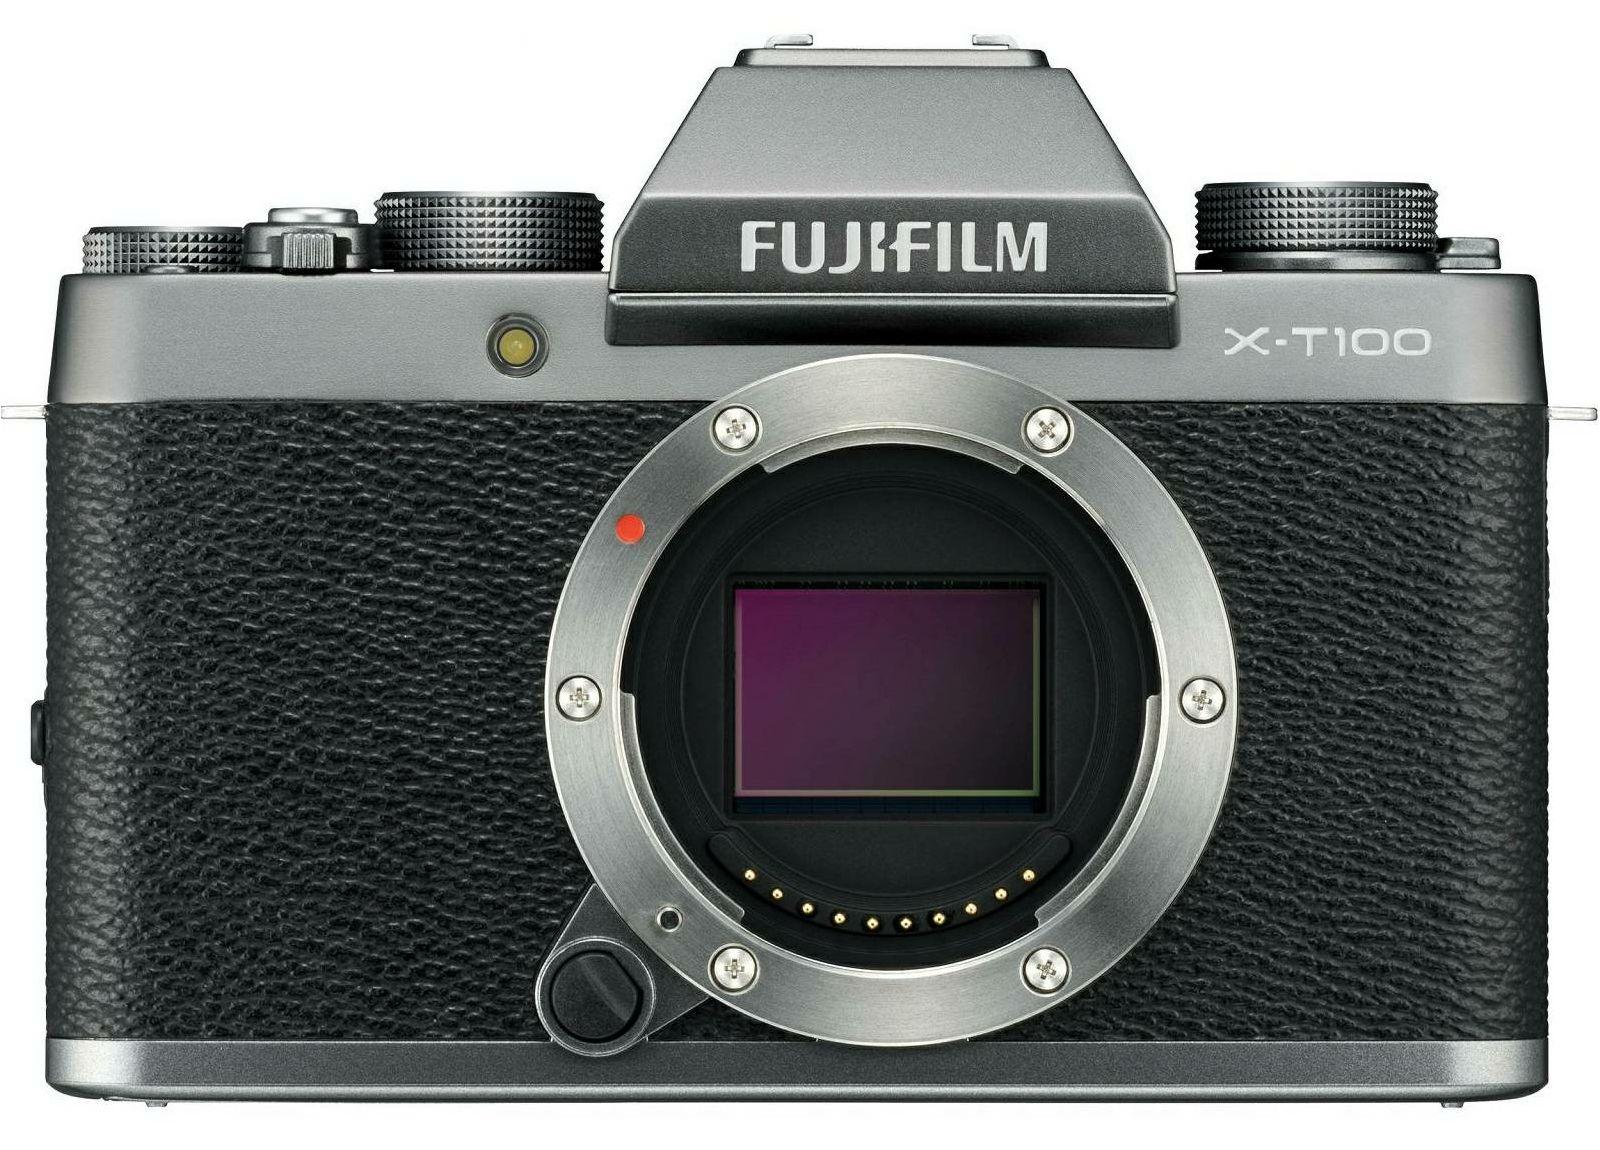 Fujifilm X-T100 Body Dark Silver tamno srebreni Digitalni fotoaparat Mirrorless camera Fuji Finepix 24MP APS-C CMOS 3.0